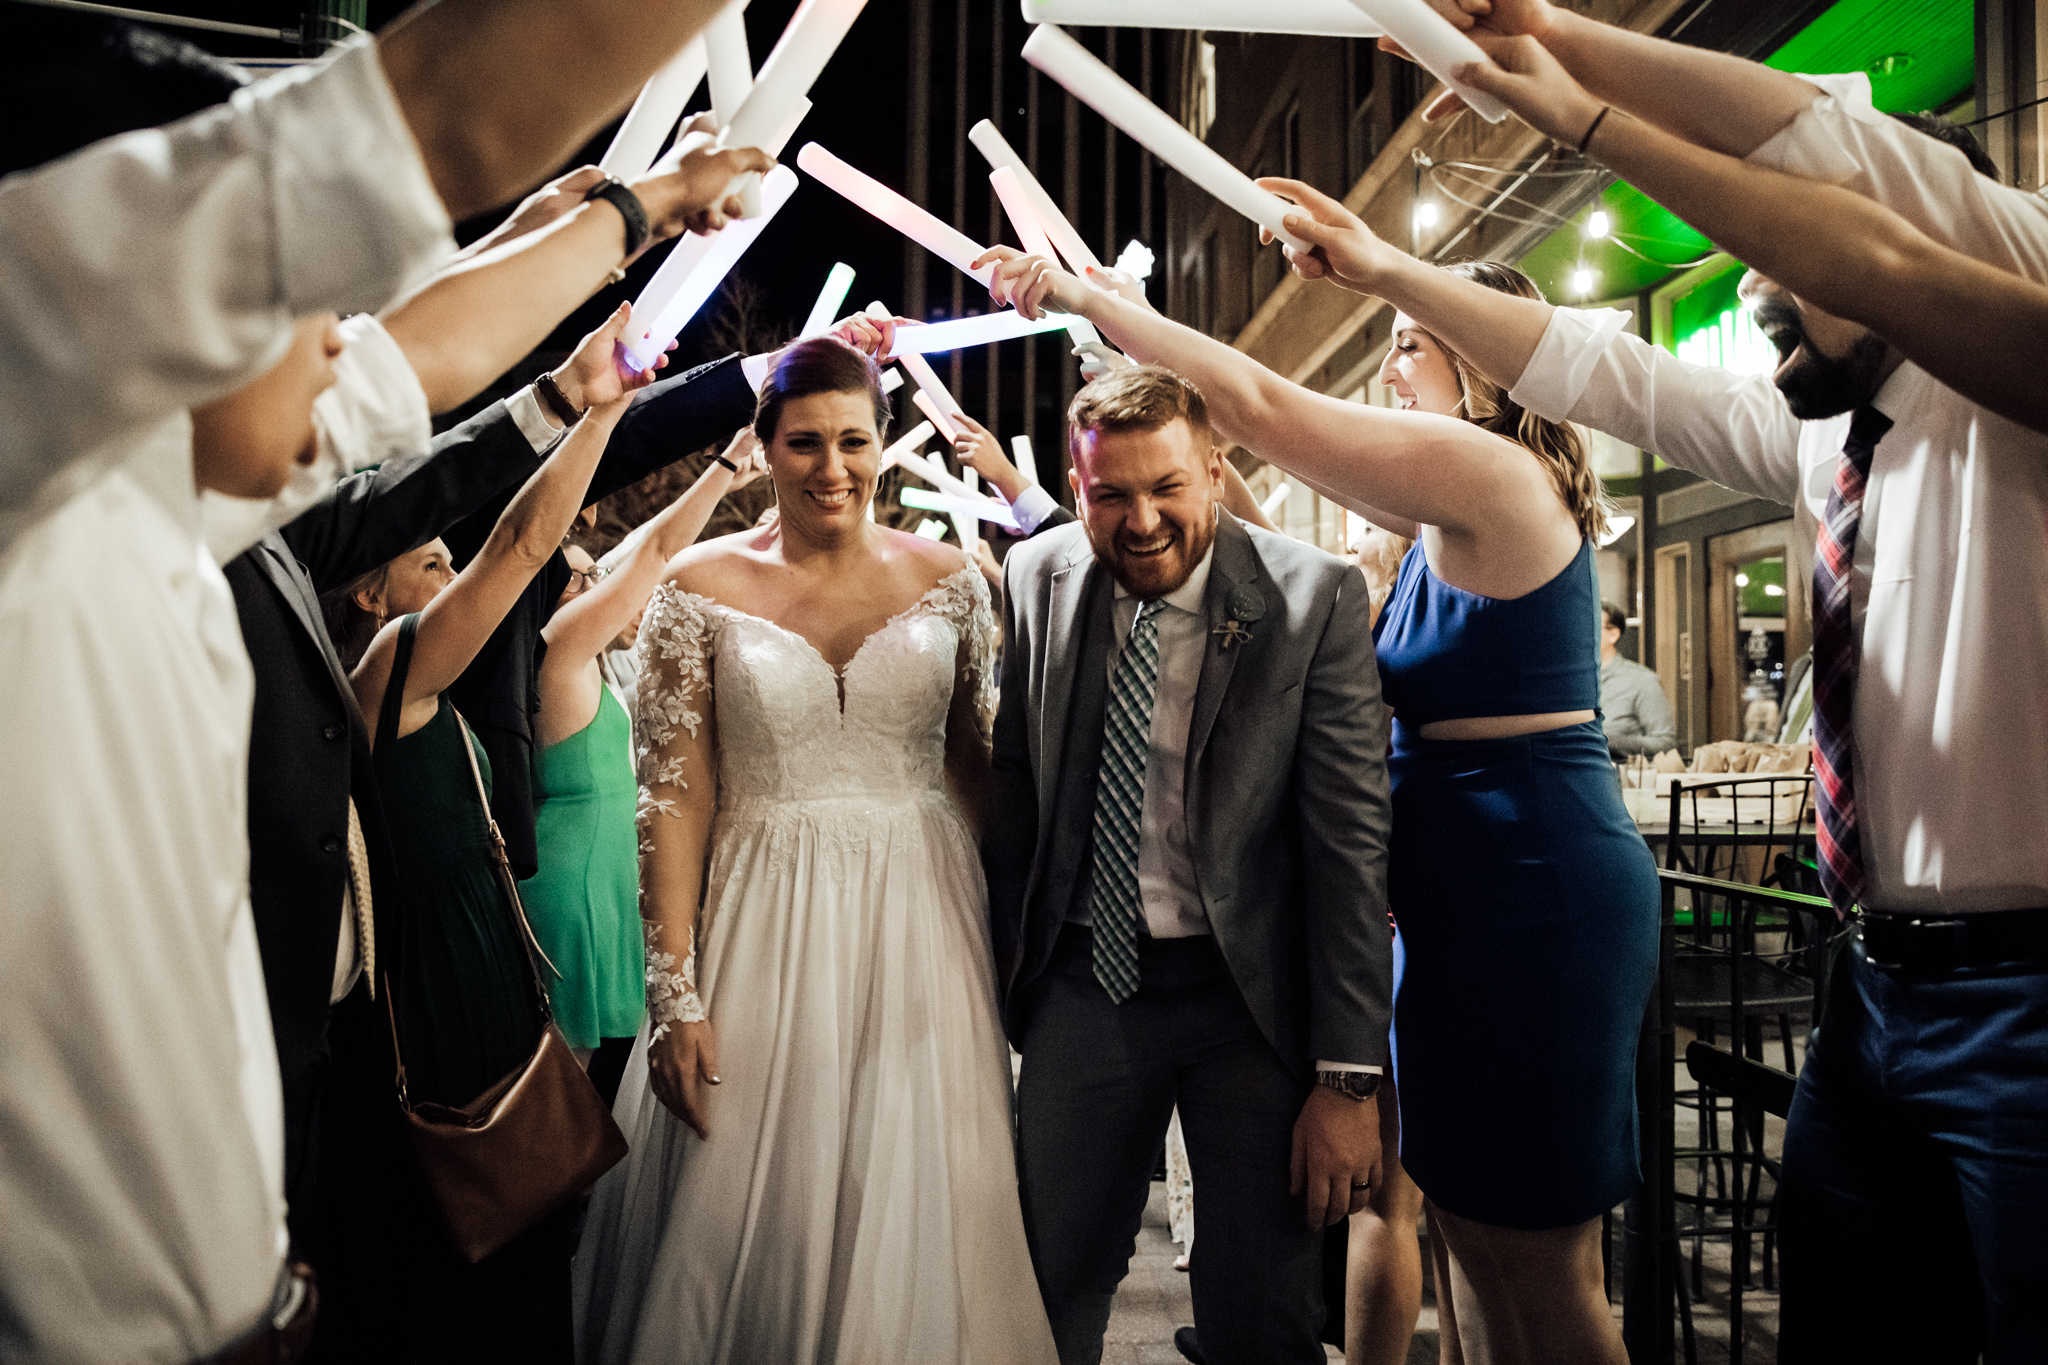 phantom-canyon-brewery-colorado-springs-wedding-photographer-237.jpg